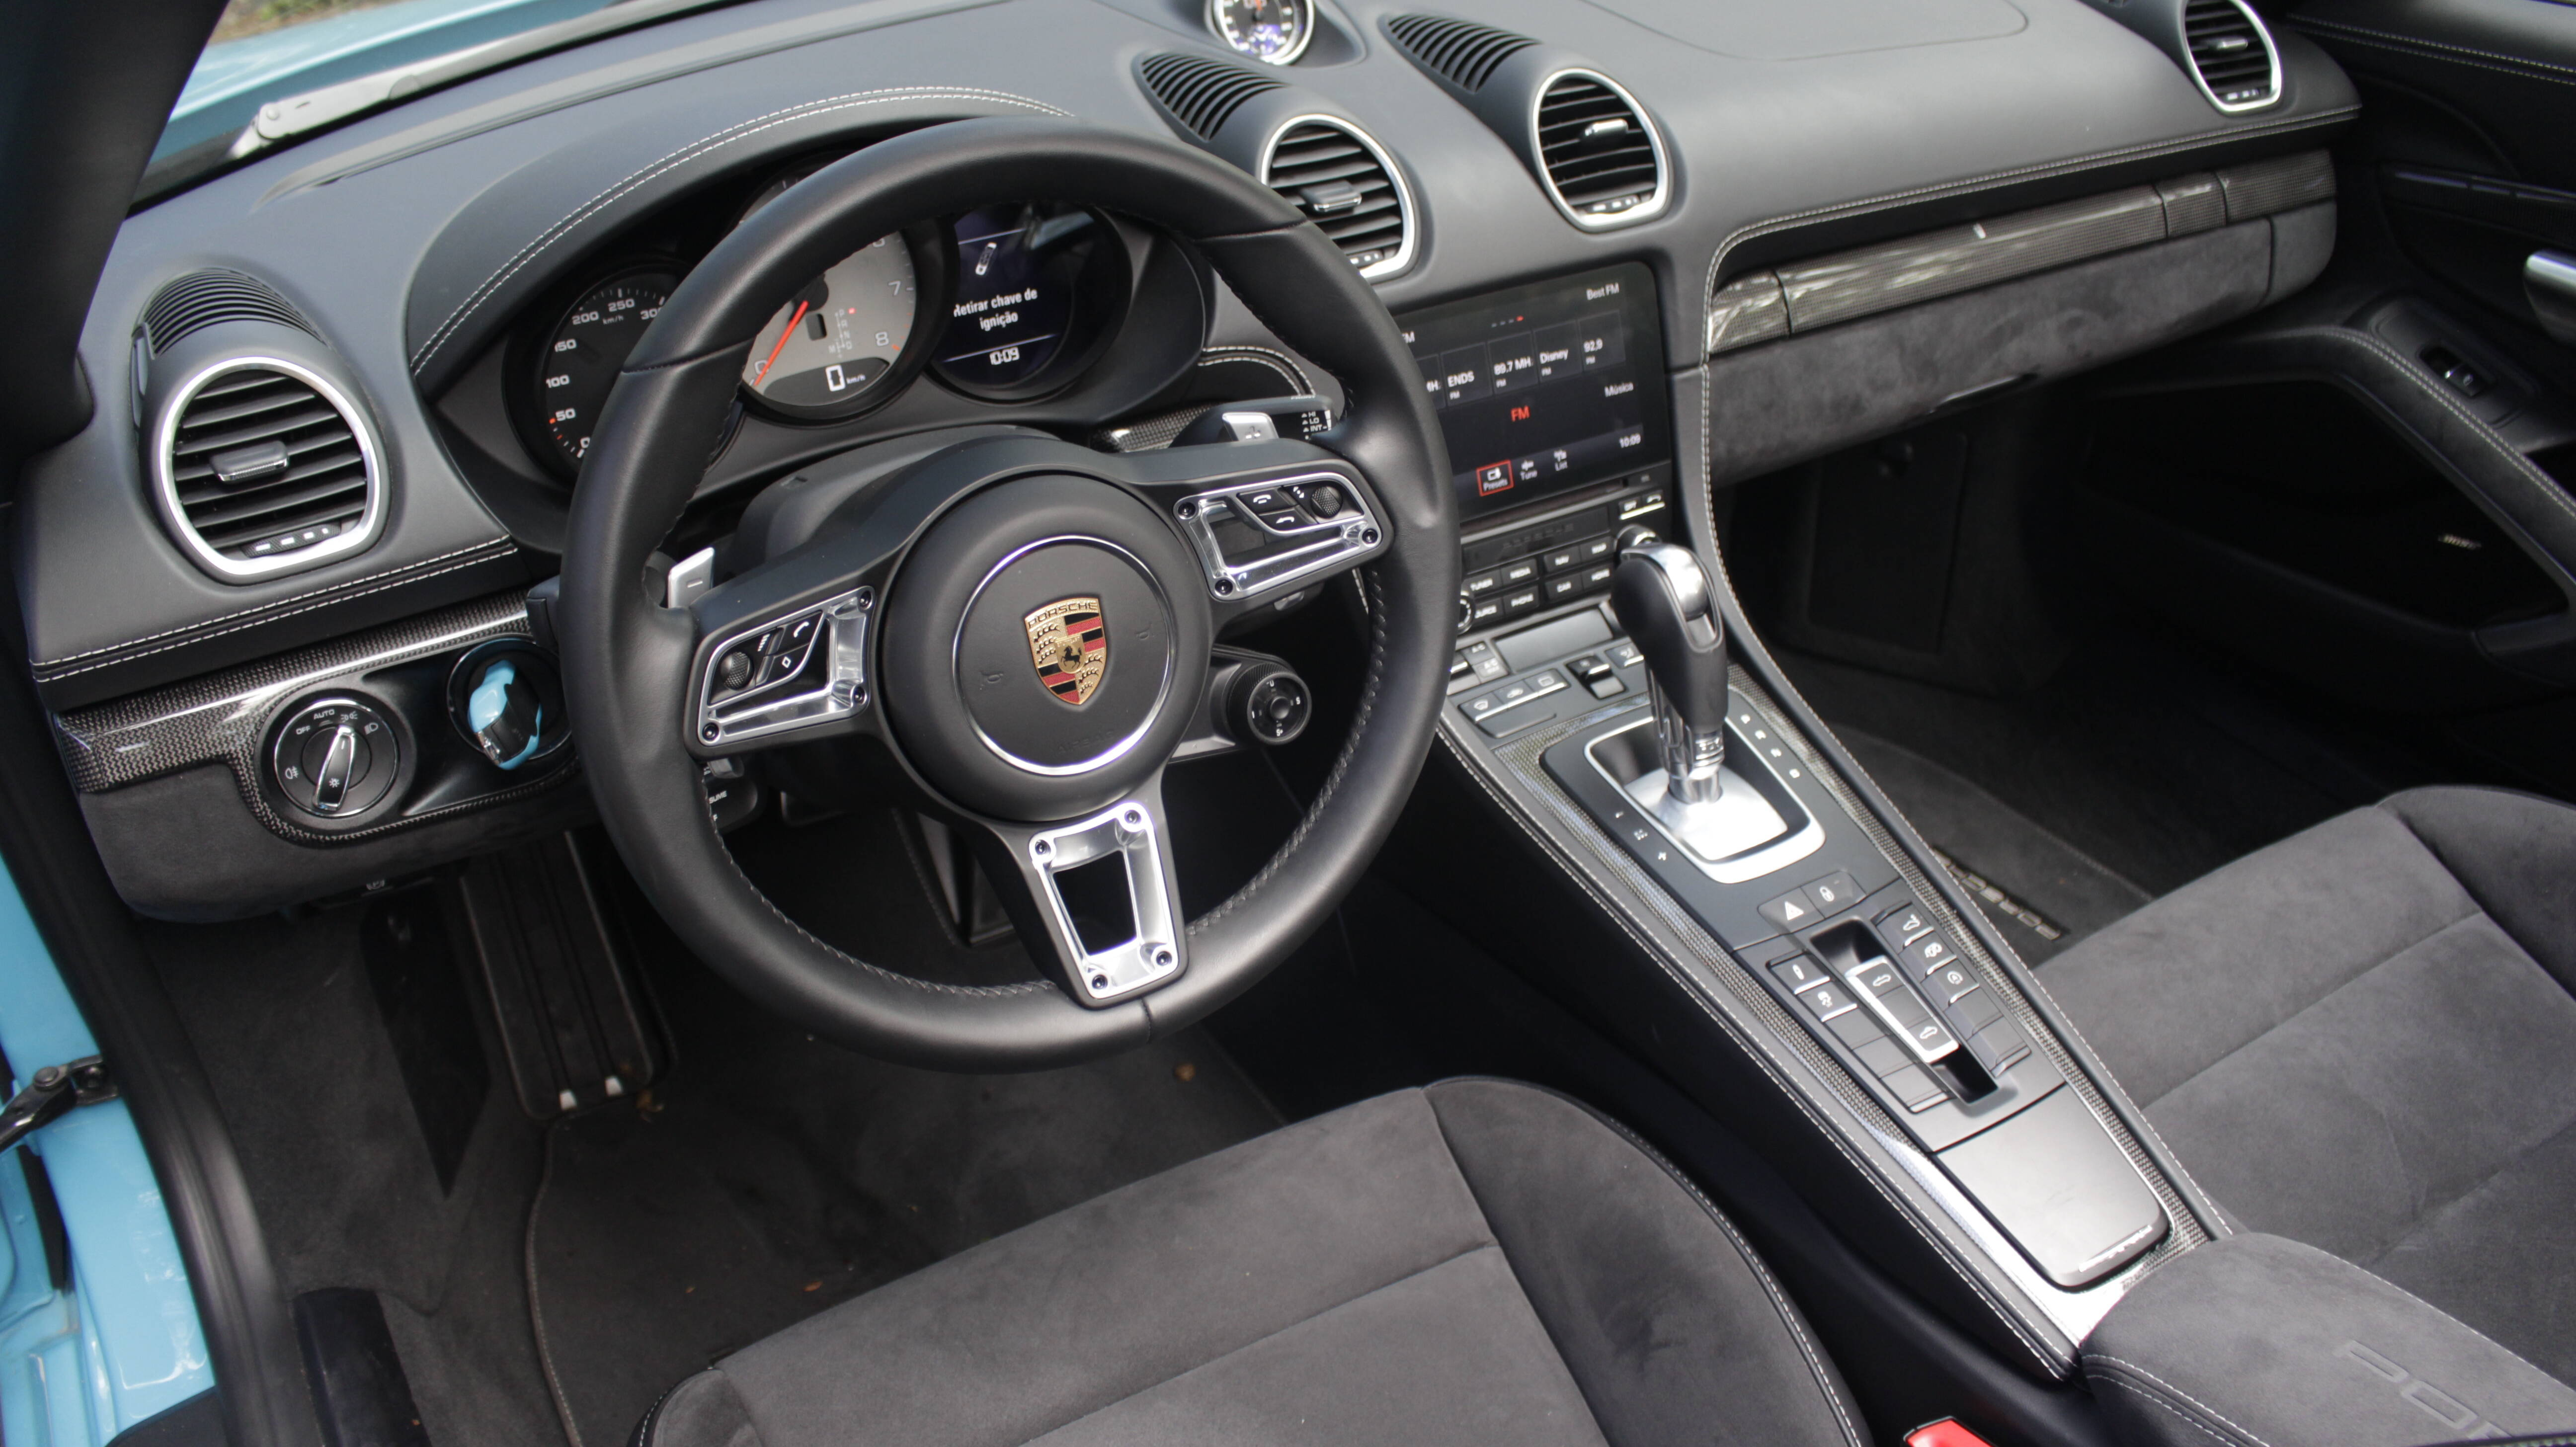 Porsche 718 Boxster GTS. Foto: Cauê Lira/iG Carros